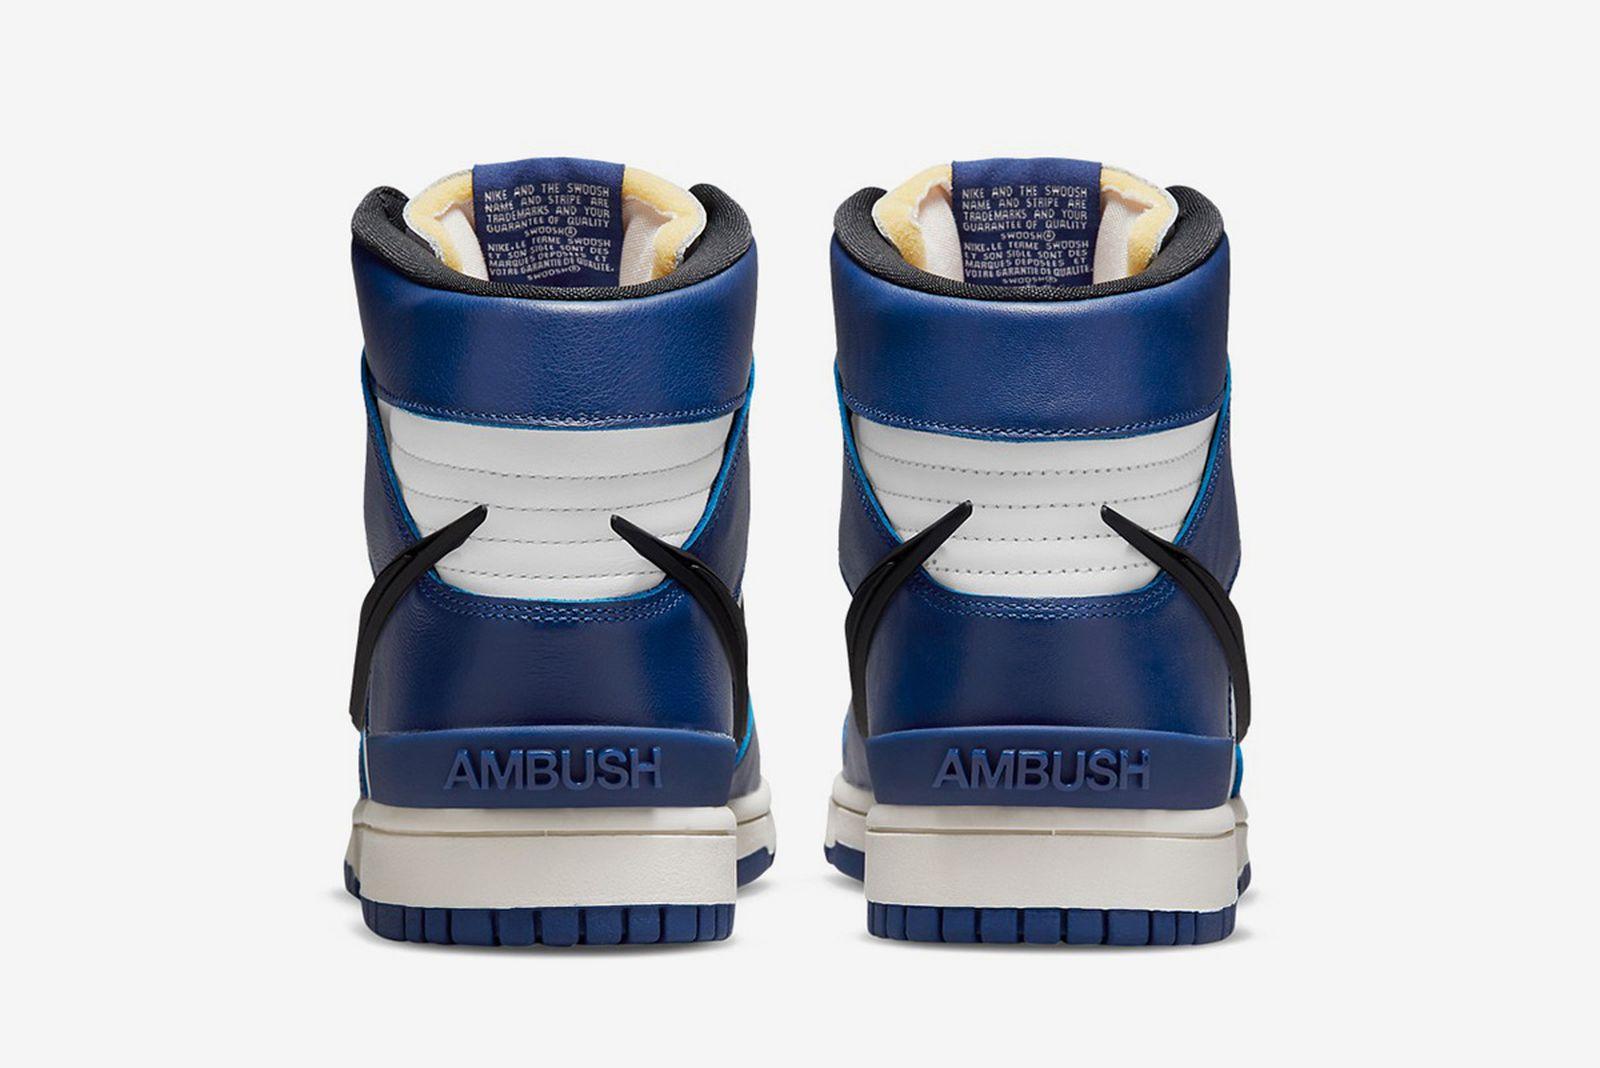 ambush-nike-dunk-high-royal-blue-release-date-price-05